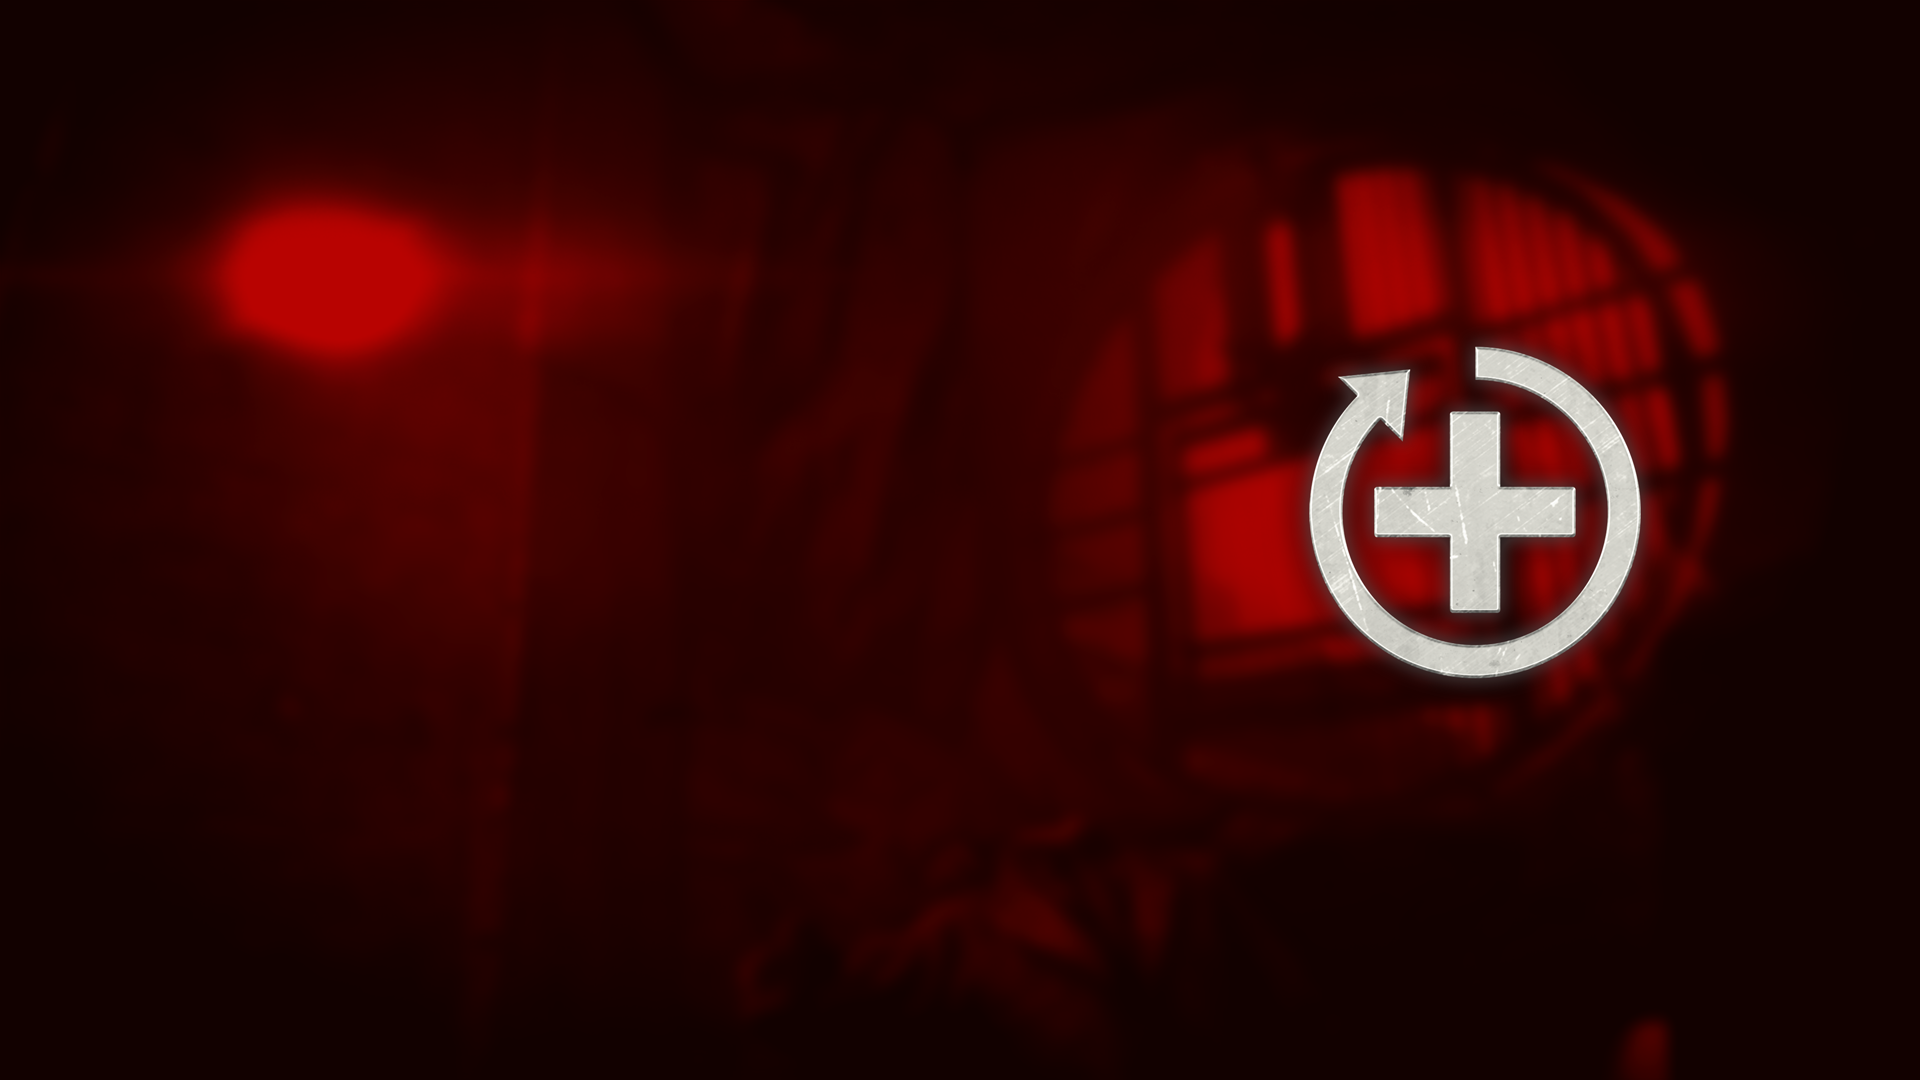 Icon for Quick regeneration